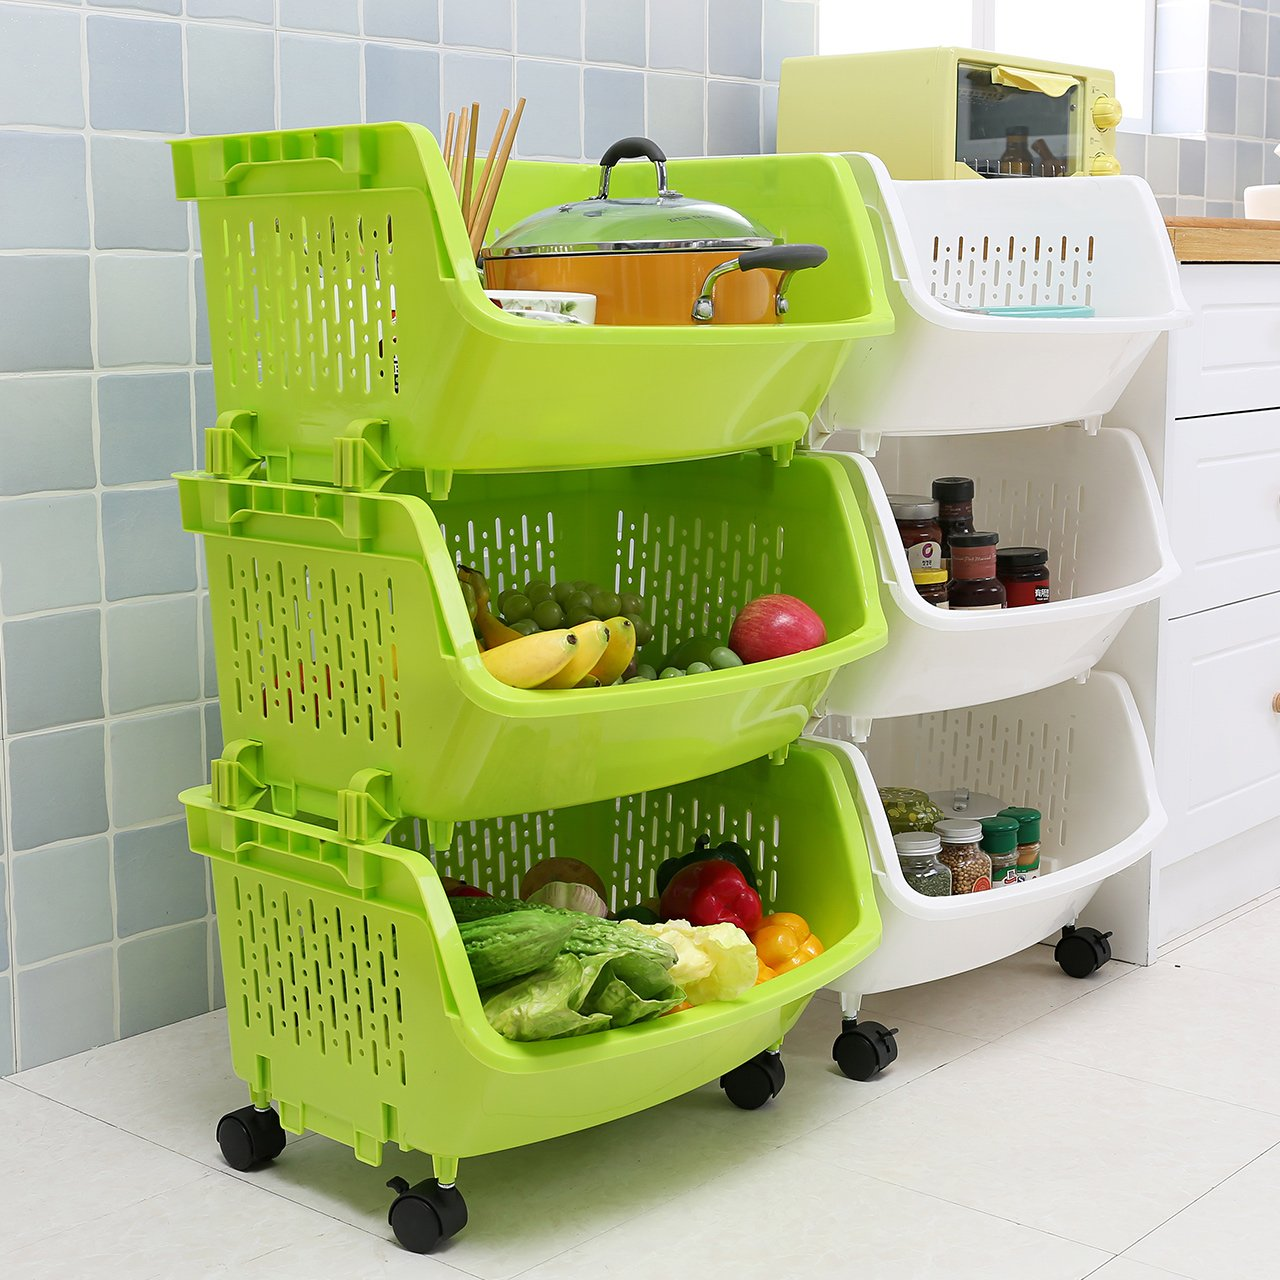 AJ Storage Stacking Bins, Household Kitchen Plastic Stackable Vertical Storage Organizational Bins Vegetable Fruit Food Storage Basket Rack Organizer AJ9001 (3, Green)